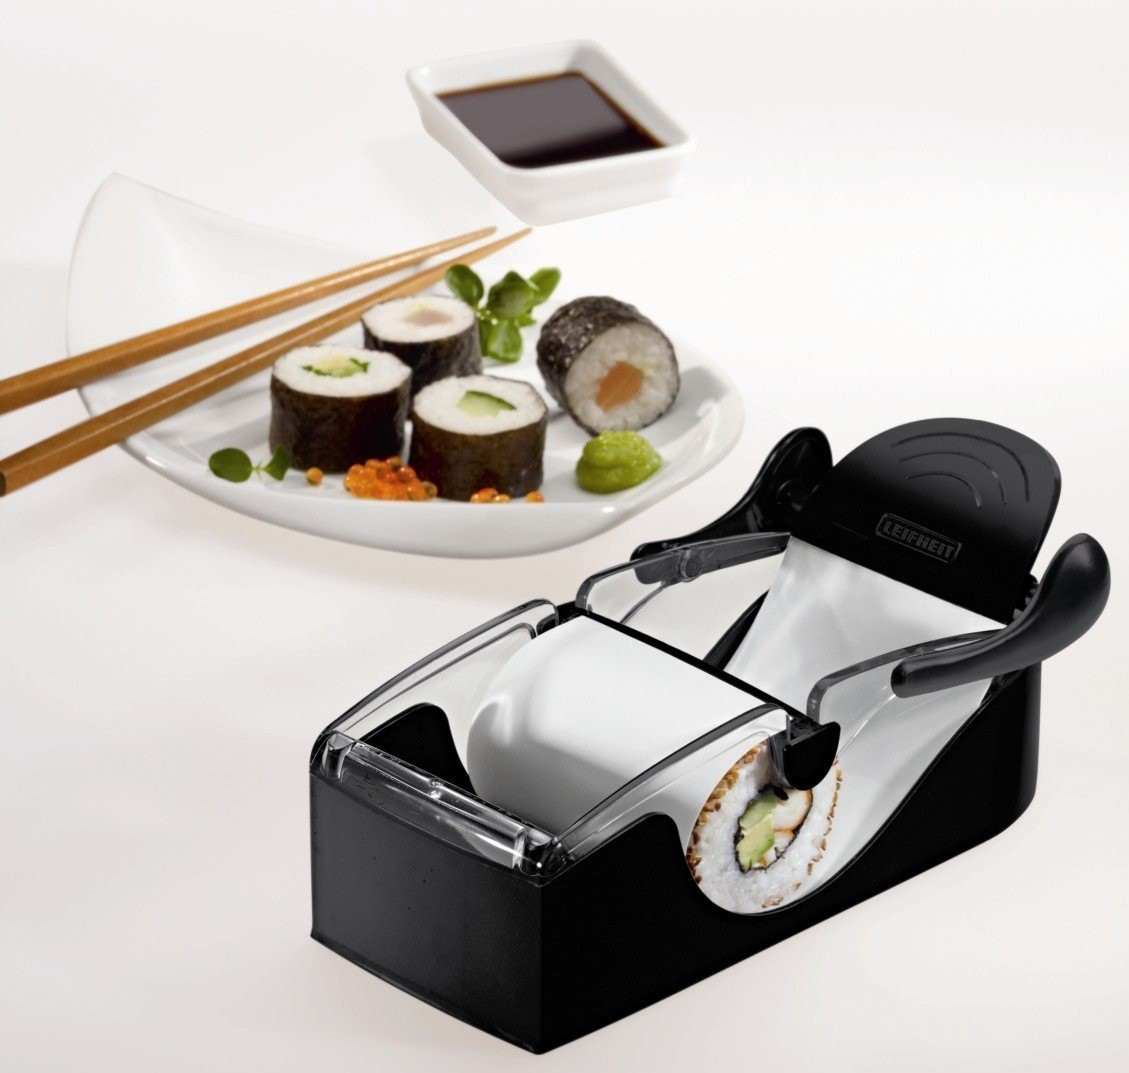 Máquina de Enrolar Sushi Manual Perfect Roll Sushi